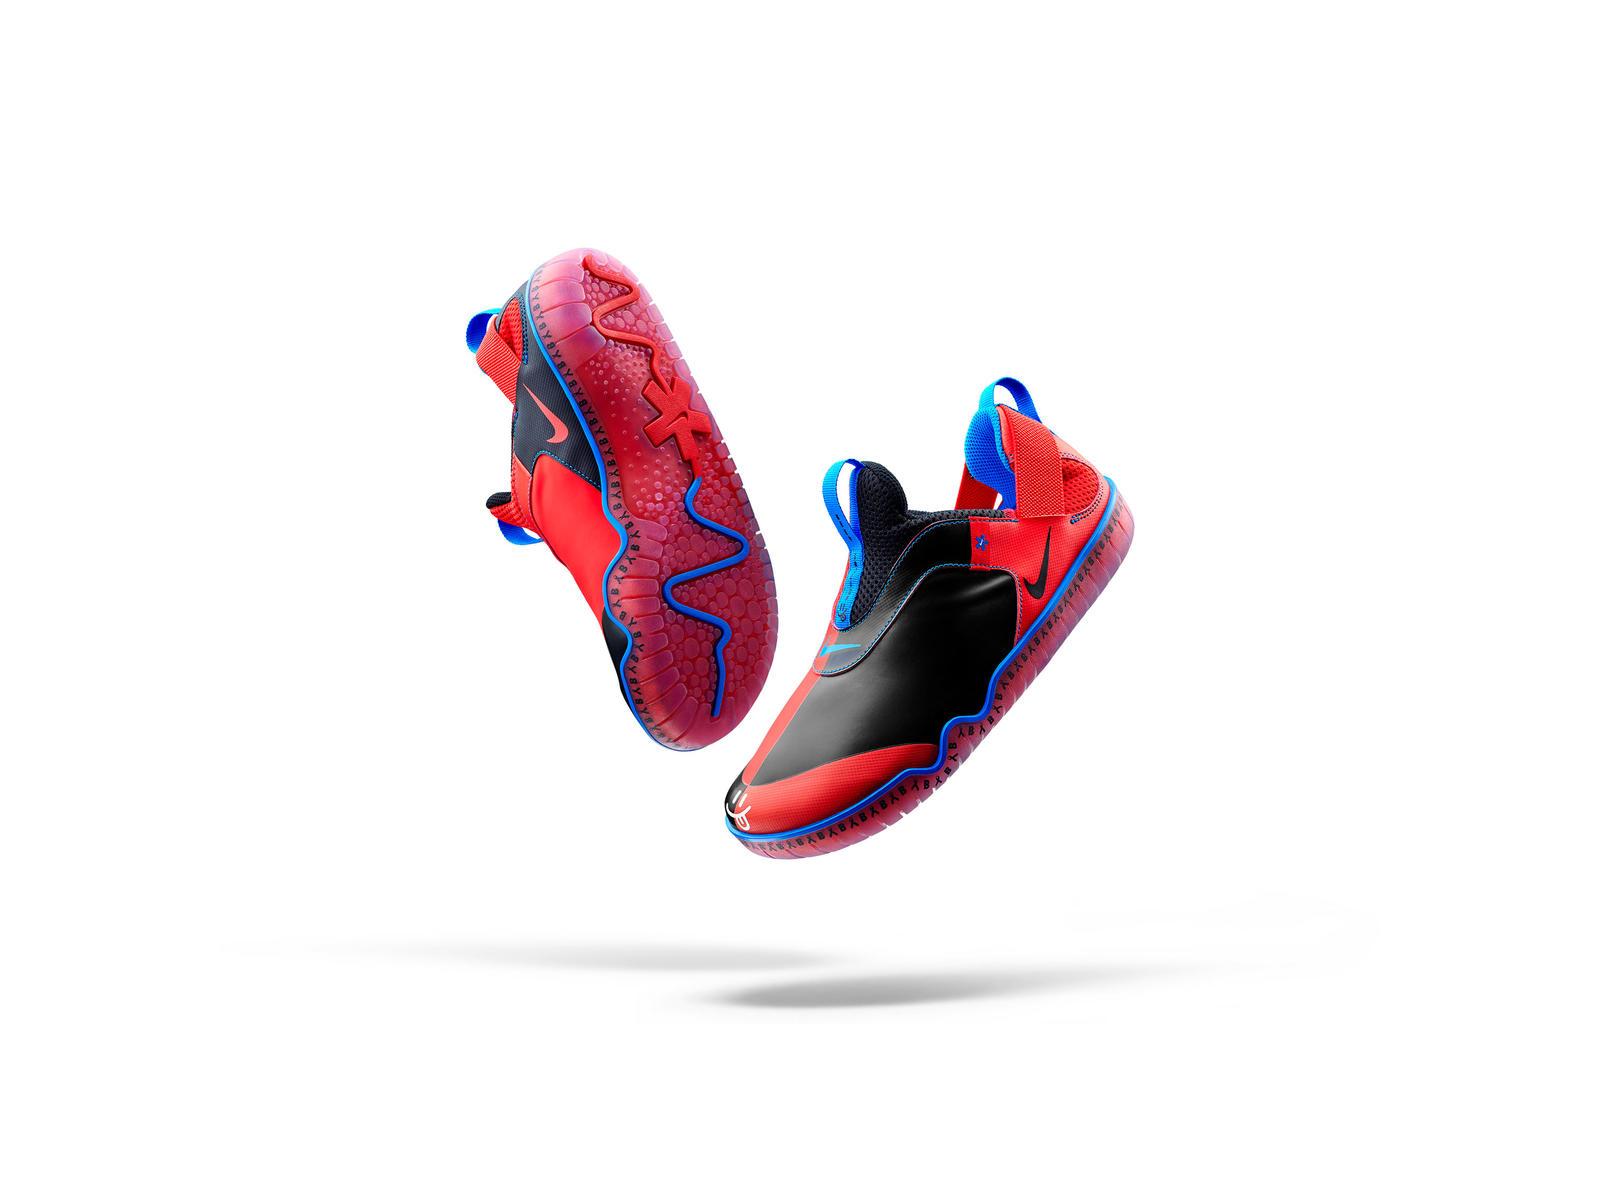 NikeNews_DoernbecherFreestyle2019_AirZoomPulse_Bransen_XVI_13308_91598